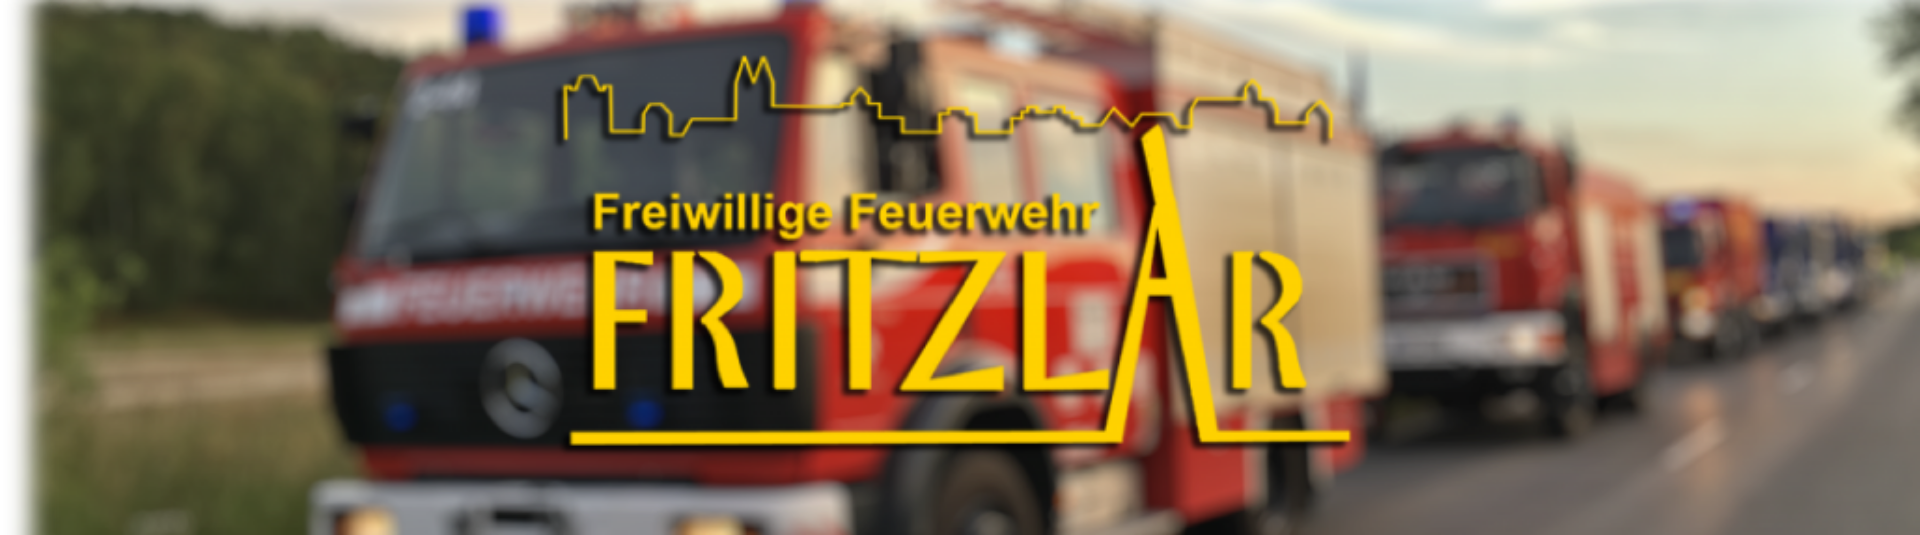 Freiwillige Feuerwehr Fritzlar